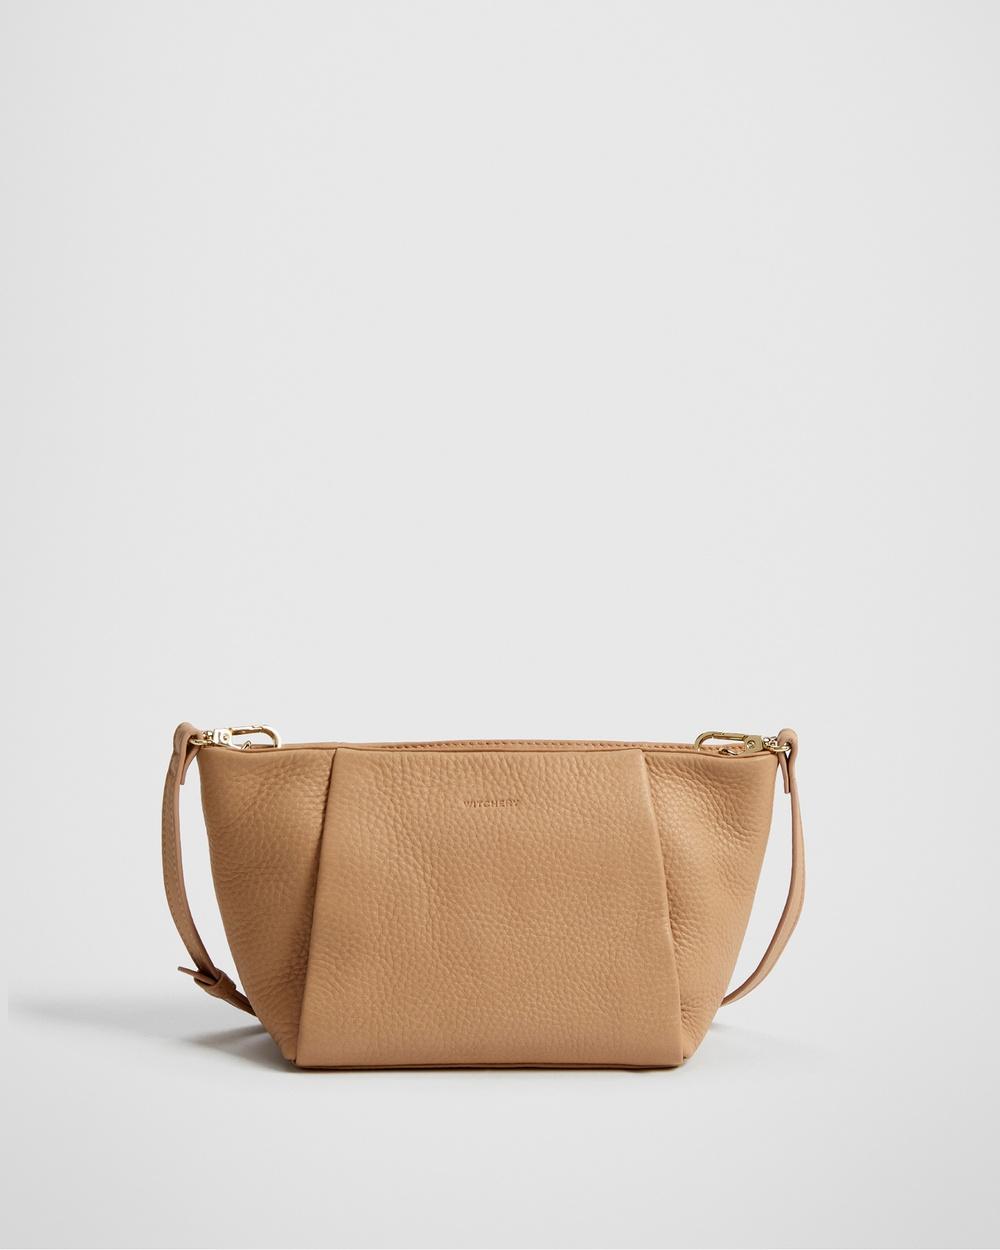 Witchery Celia Mini Pebble Crossbody Bag Bags brown Laptop Bags Australia